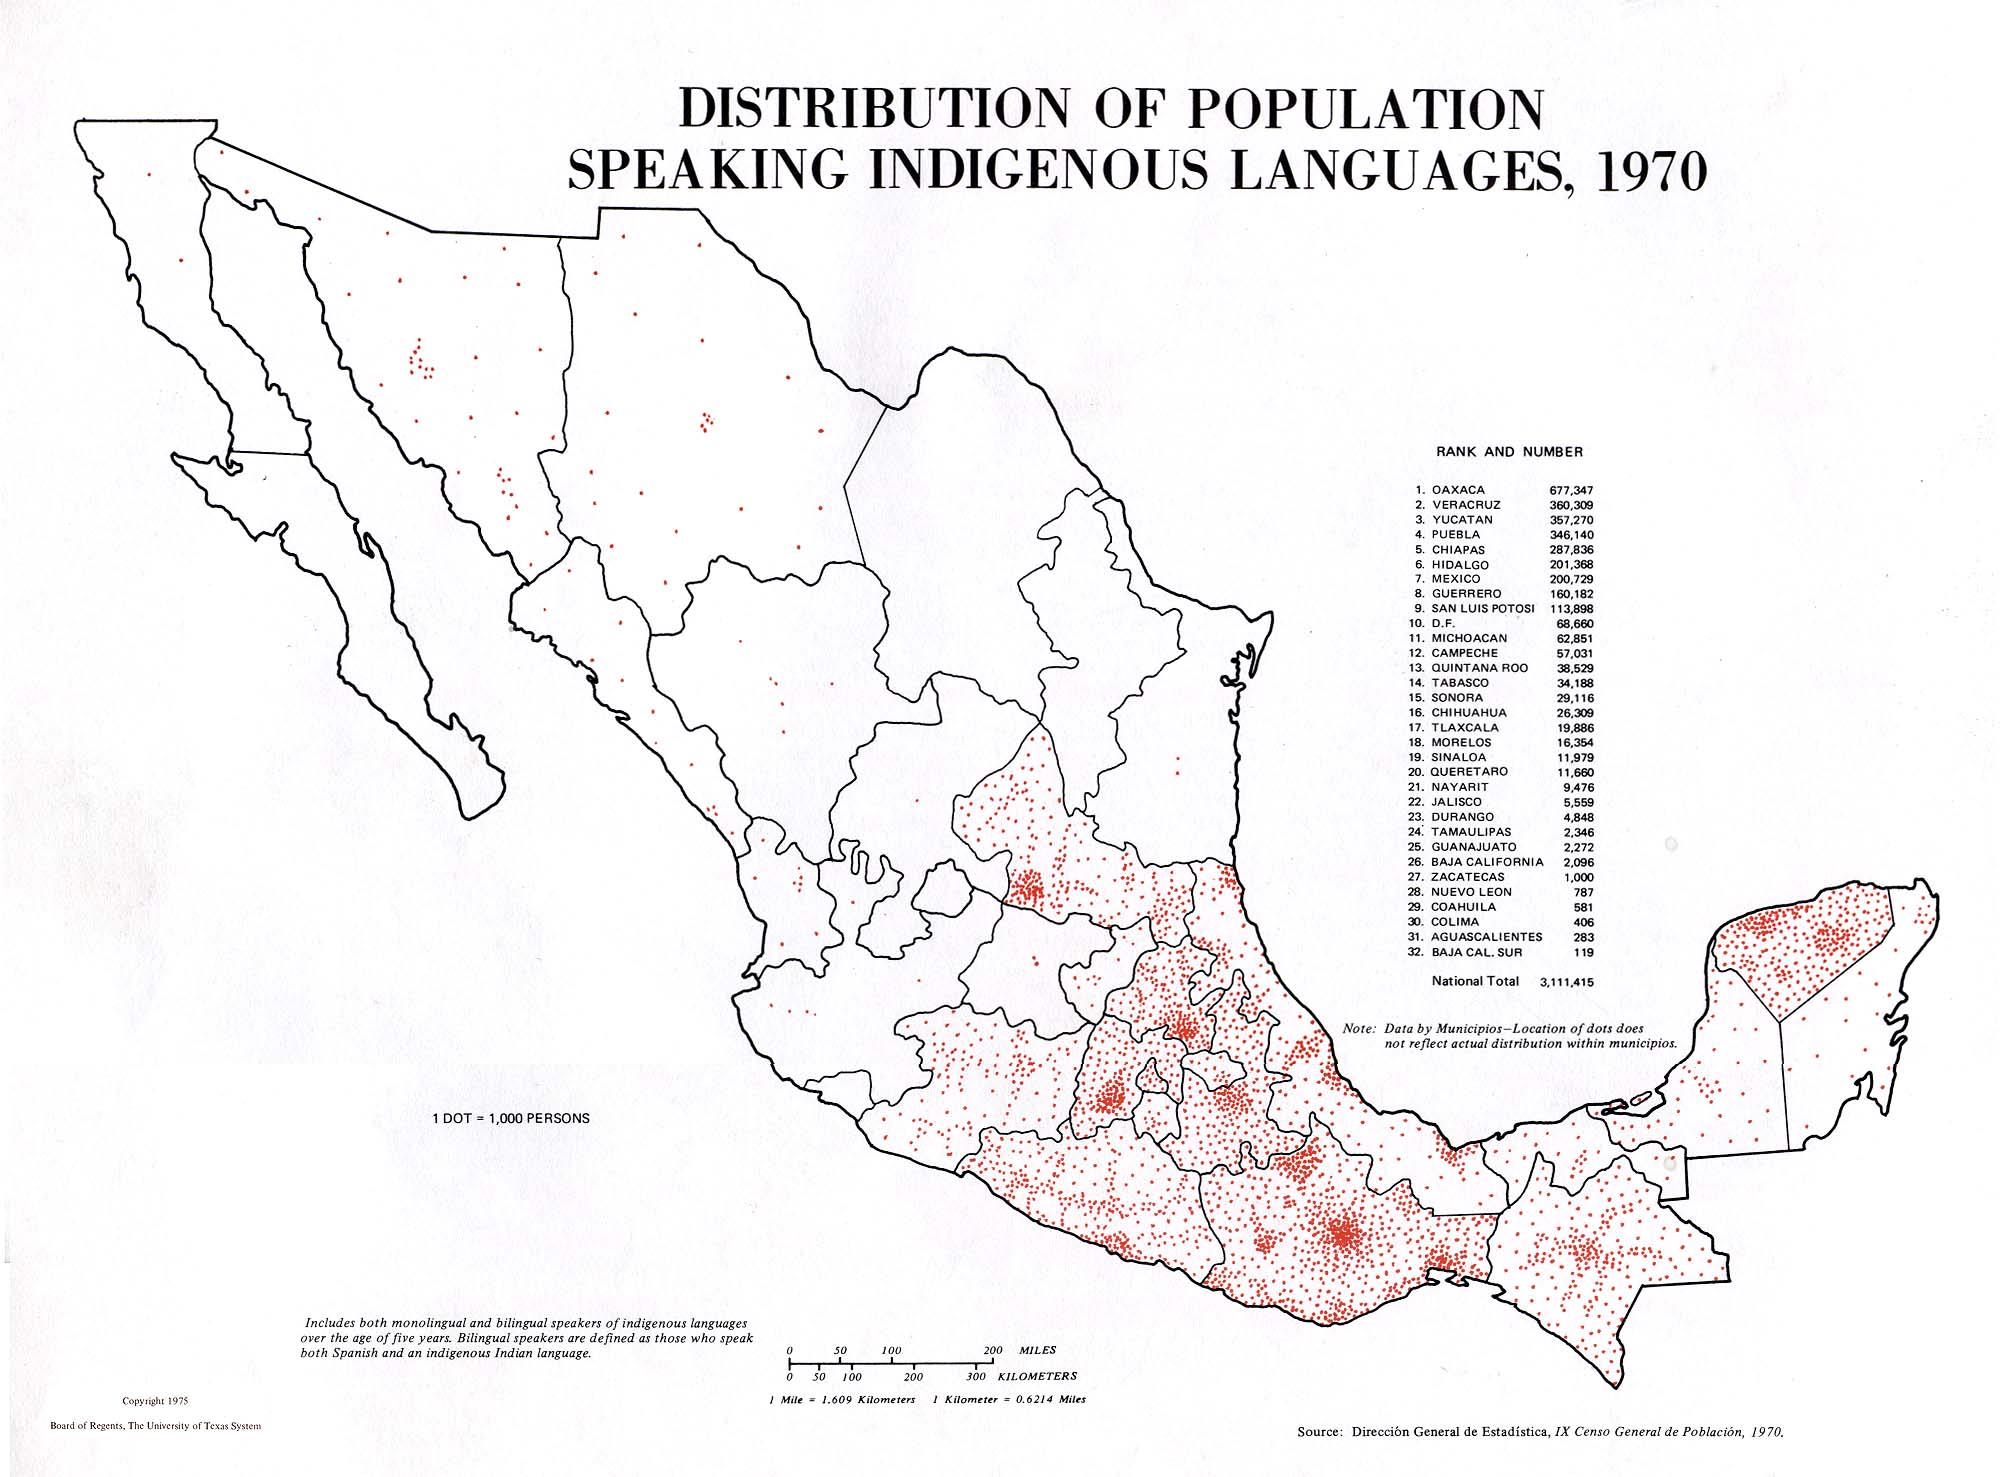 Lenguas Indígenas, México 1940, 1970